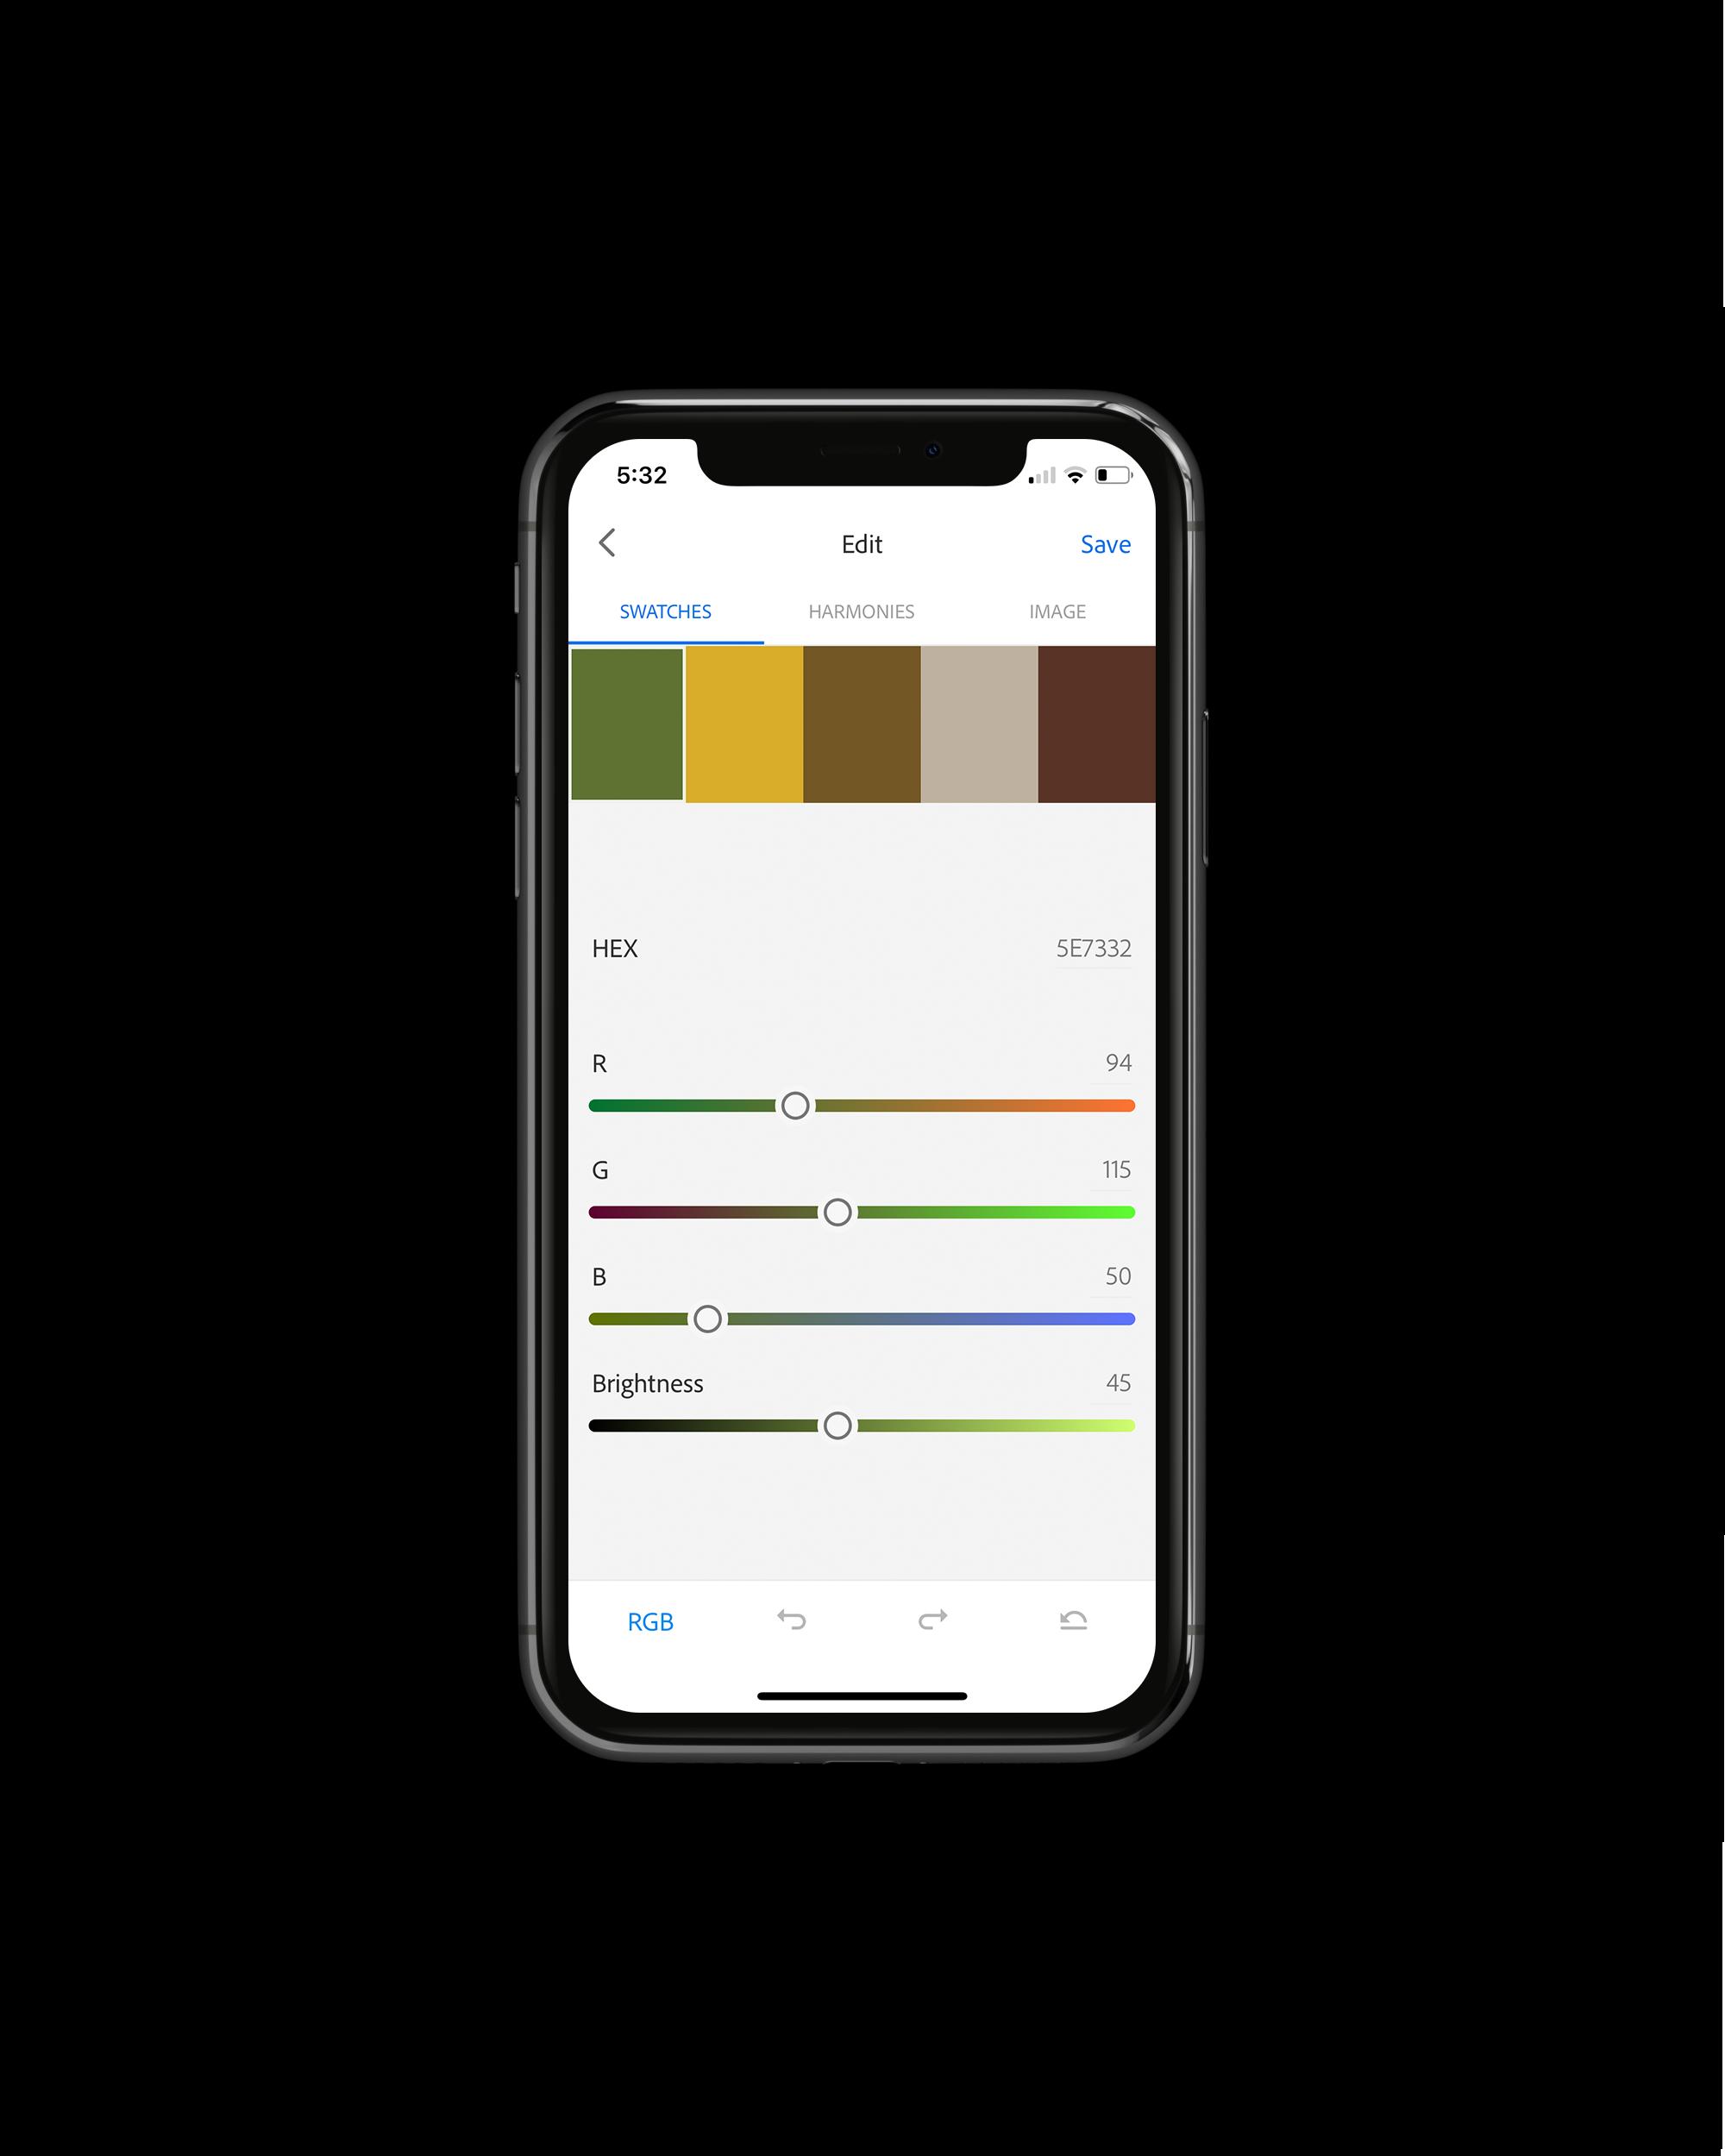 Adobe Color example Adobe Cature app